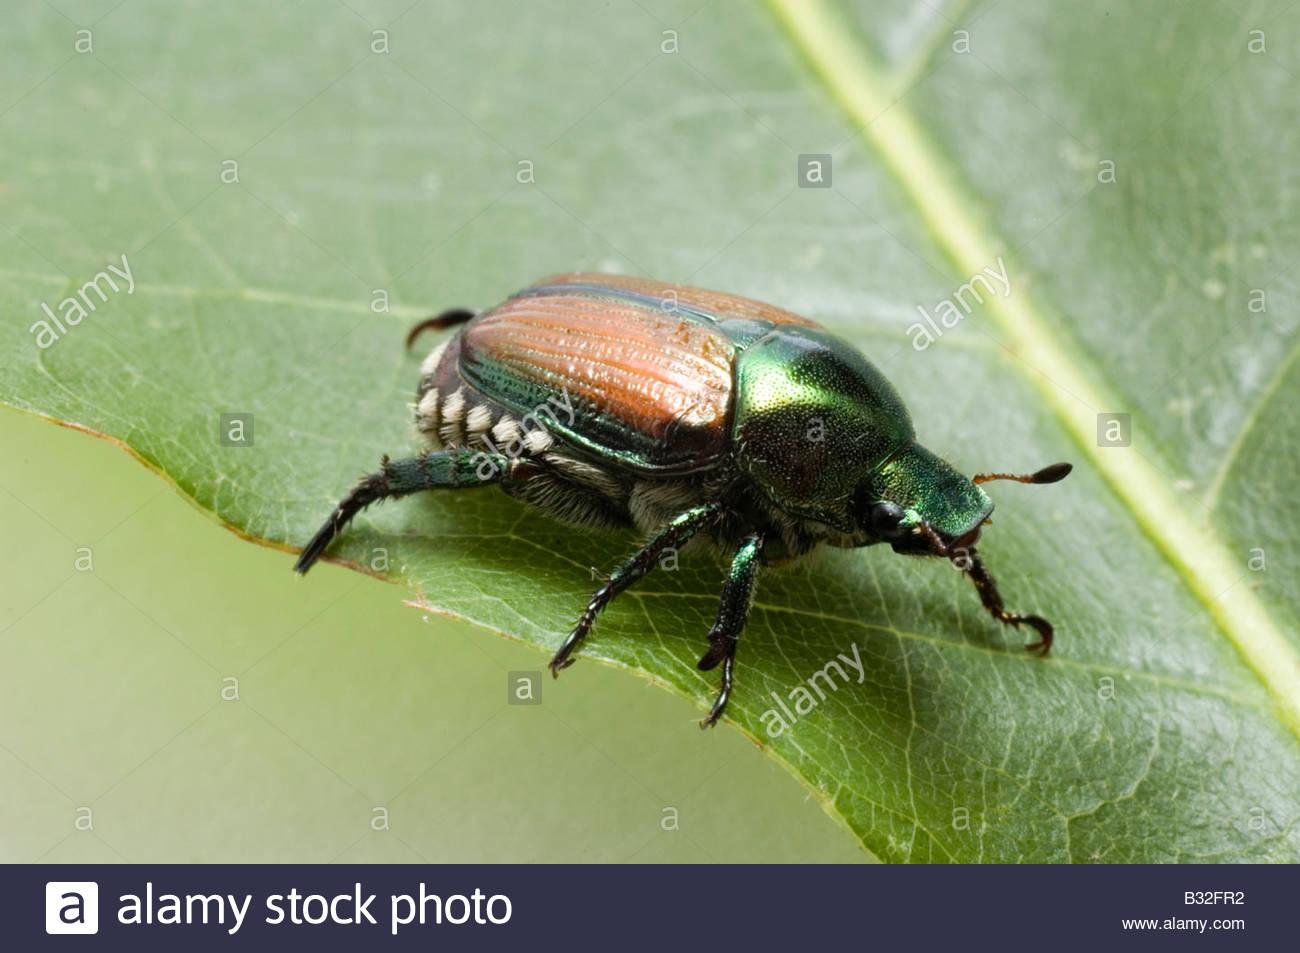 Japanese beetle - Stock Image